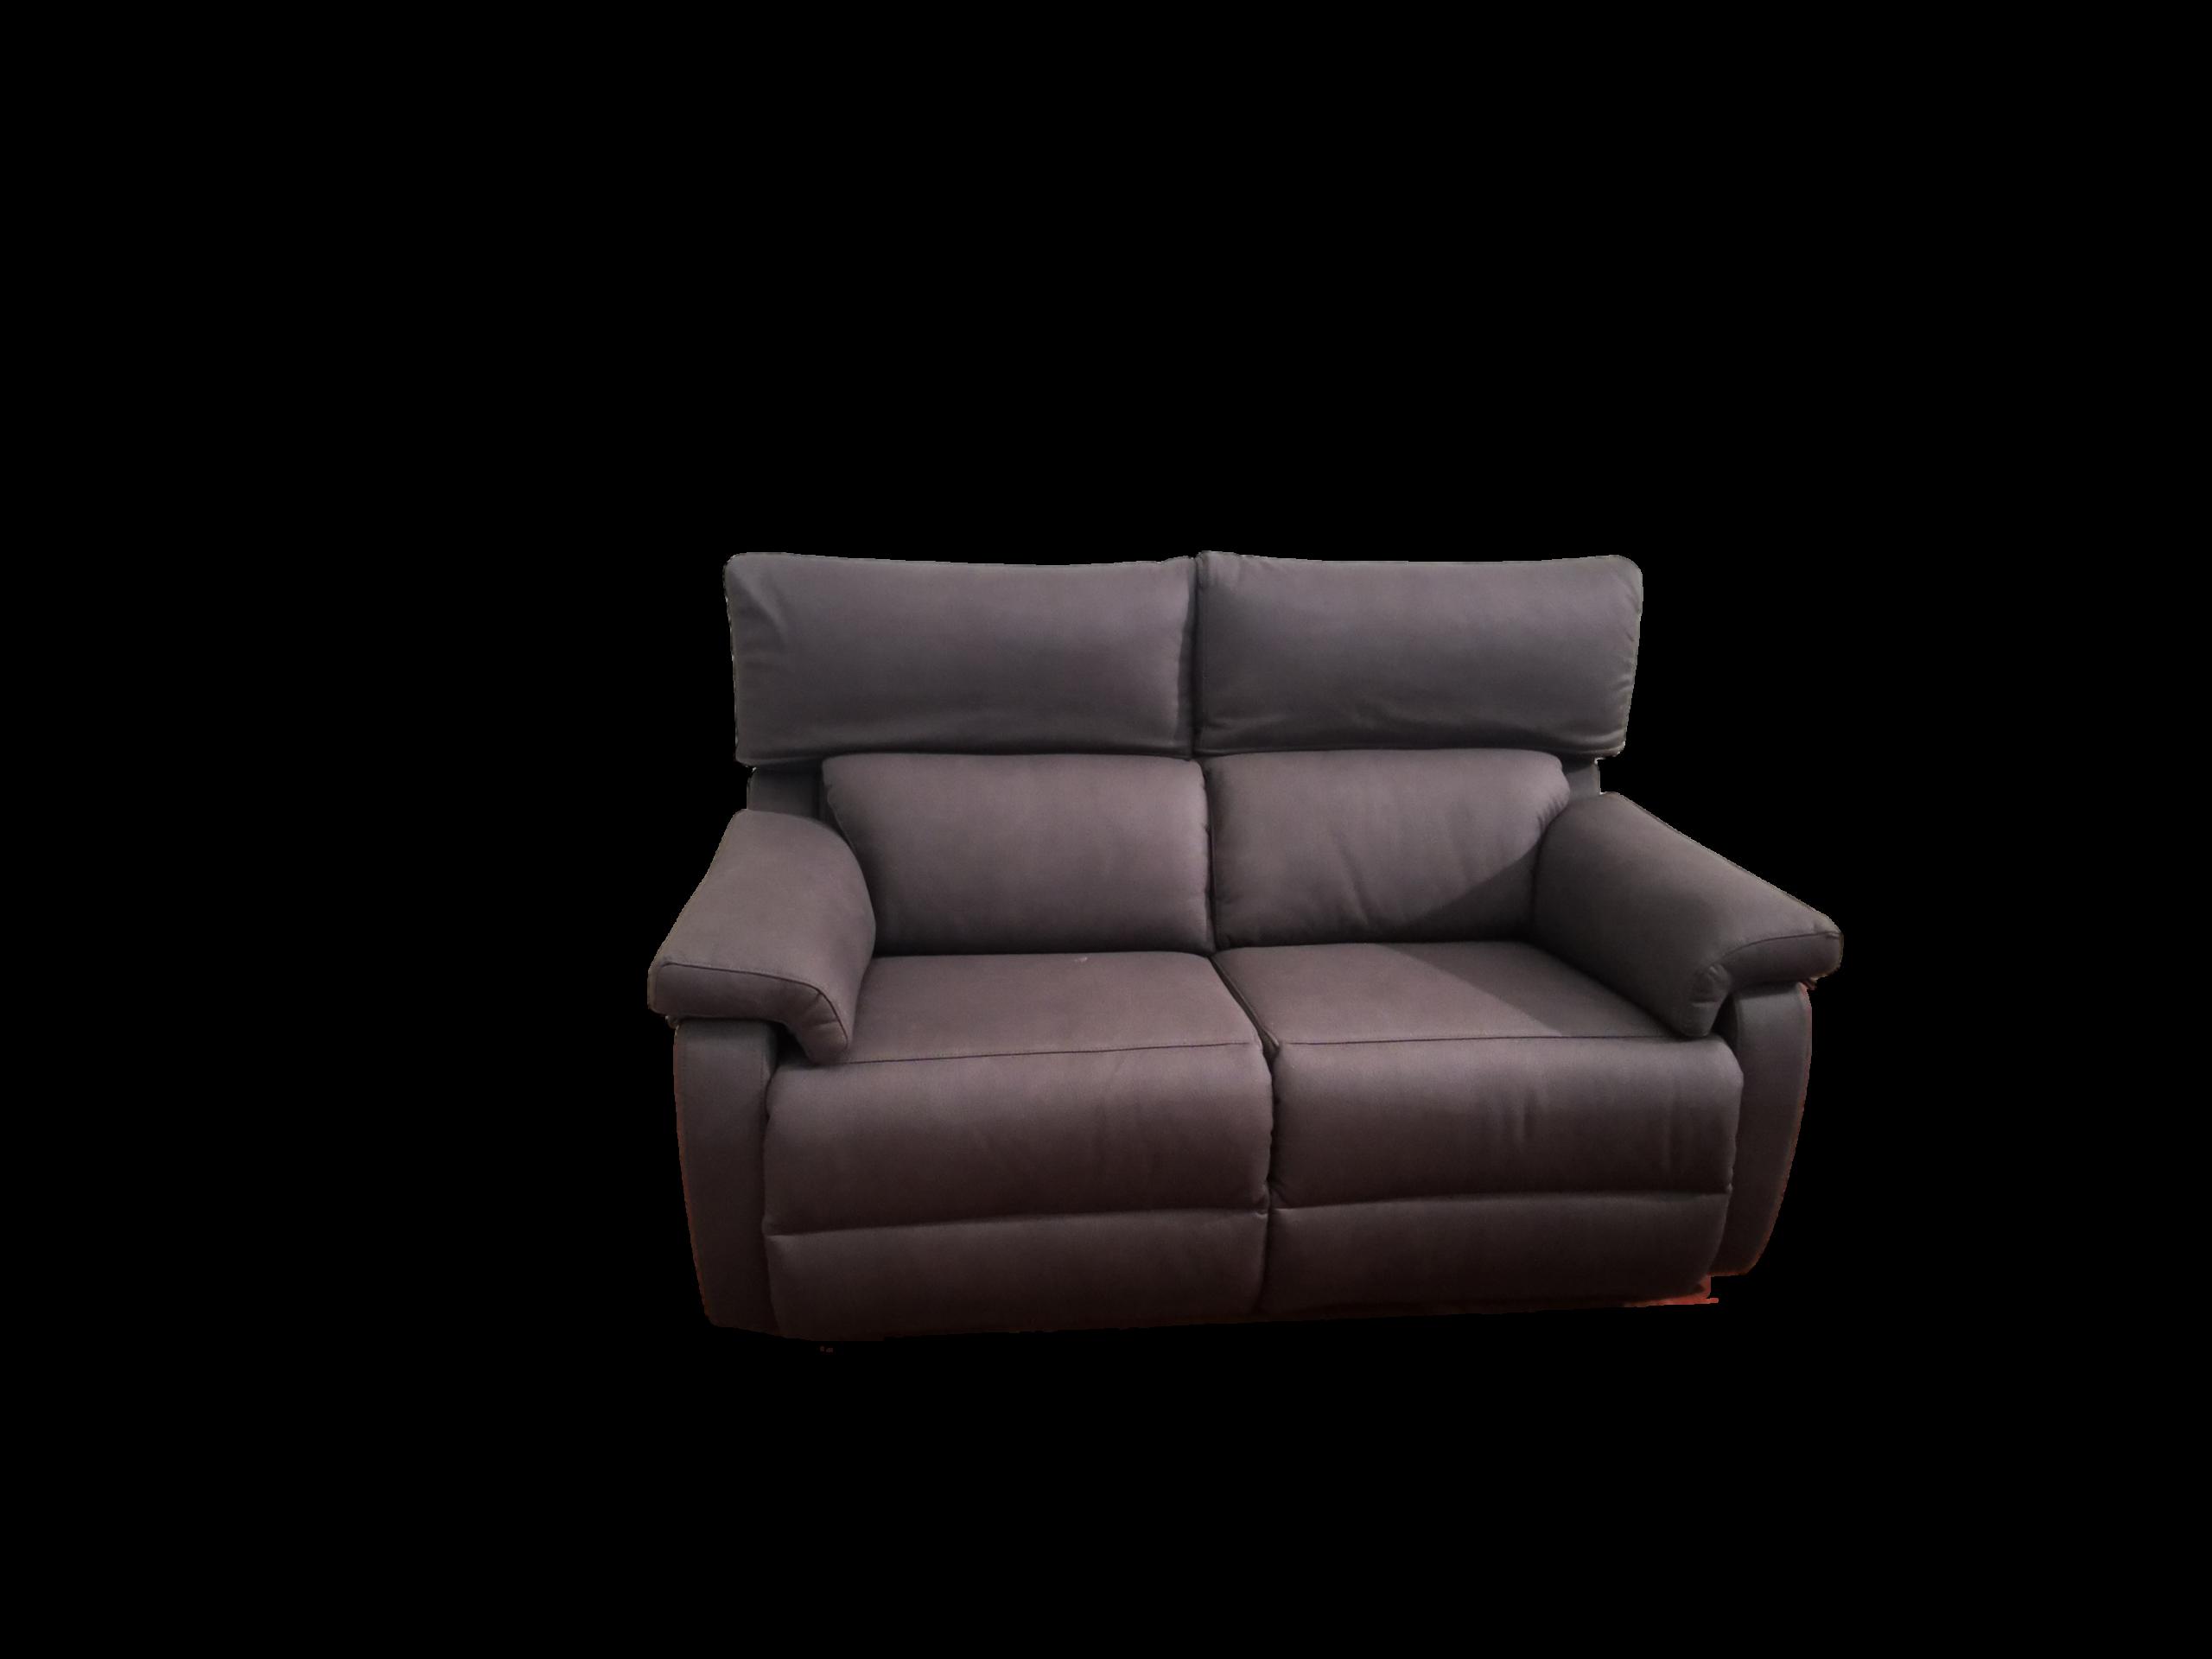 sofa-mod-boom-166-mt-2-motores-400e